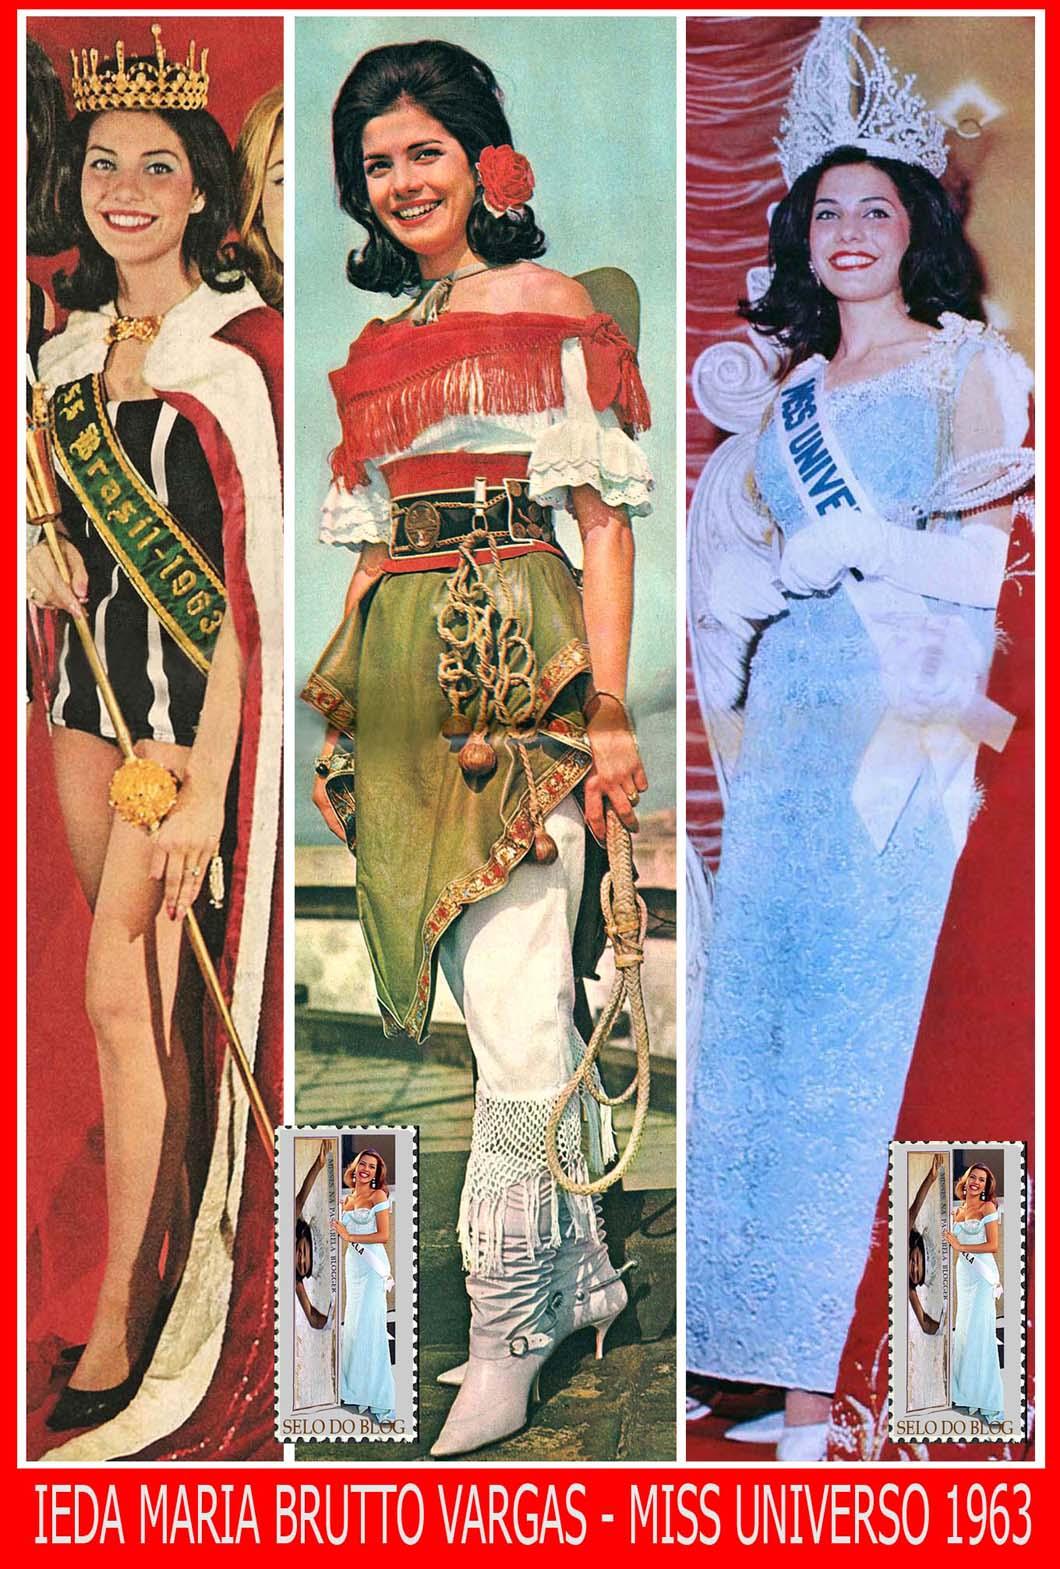 ✾◕‿◕✾ Galeria de Ieda Maria Vargas, Miss Universe 1963.✾◕‿◕✾ - Página 3 Em%2B3%2Btempos%2Bcopy